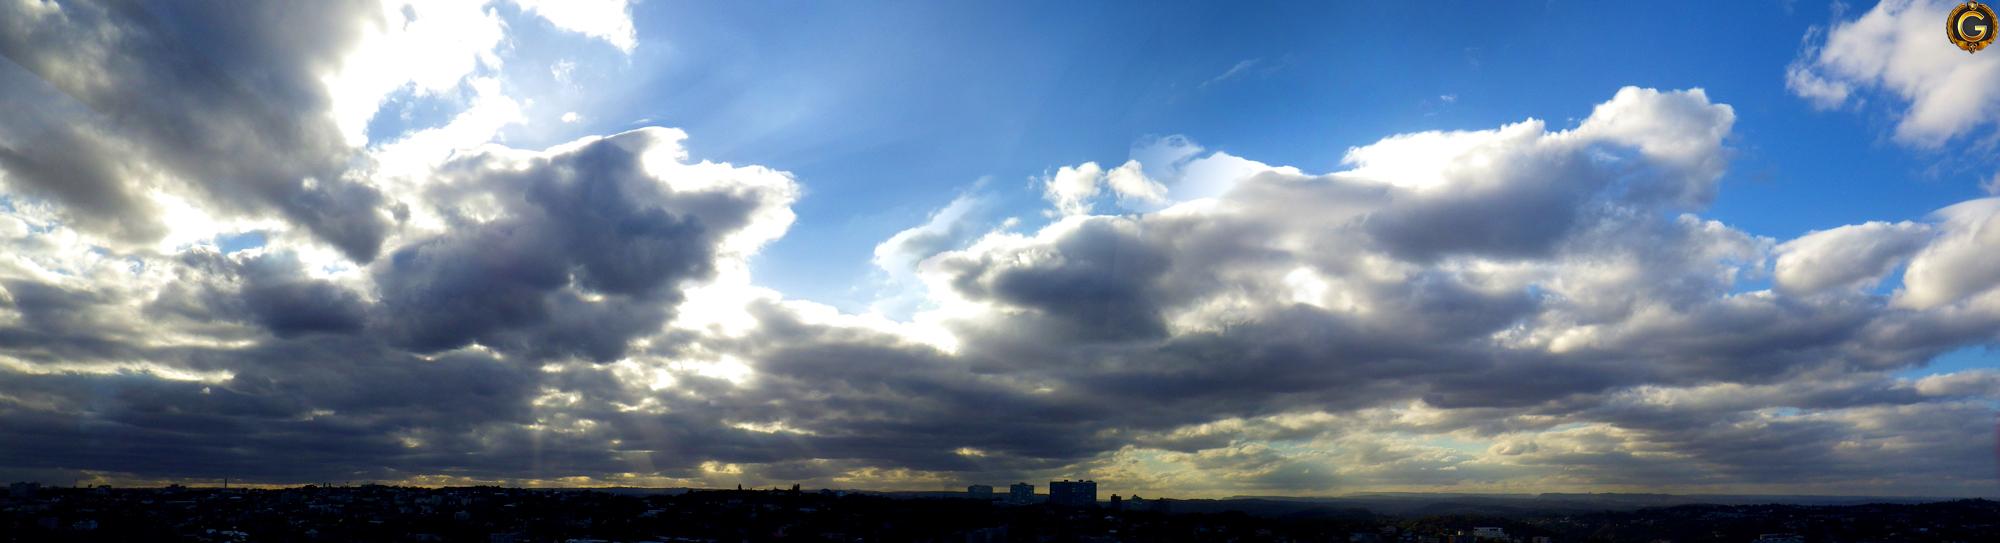 South African Big Sky Panorama, Taken with a Pentax Optio WG2